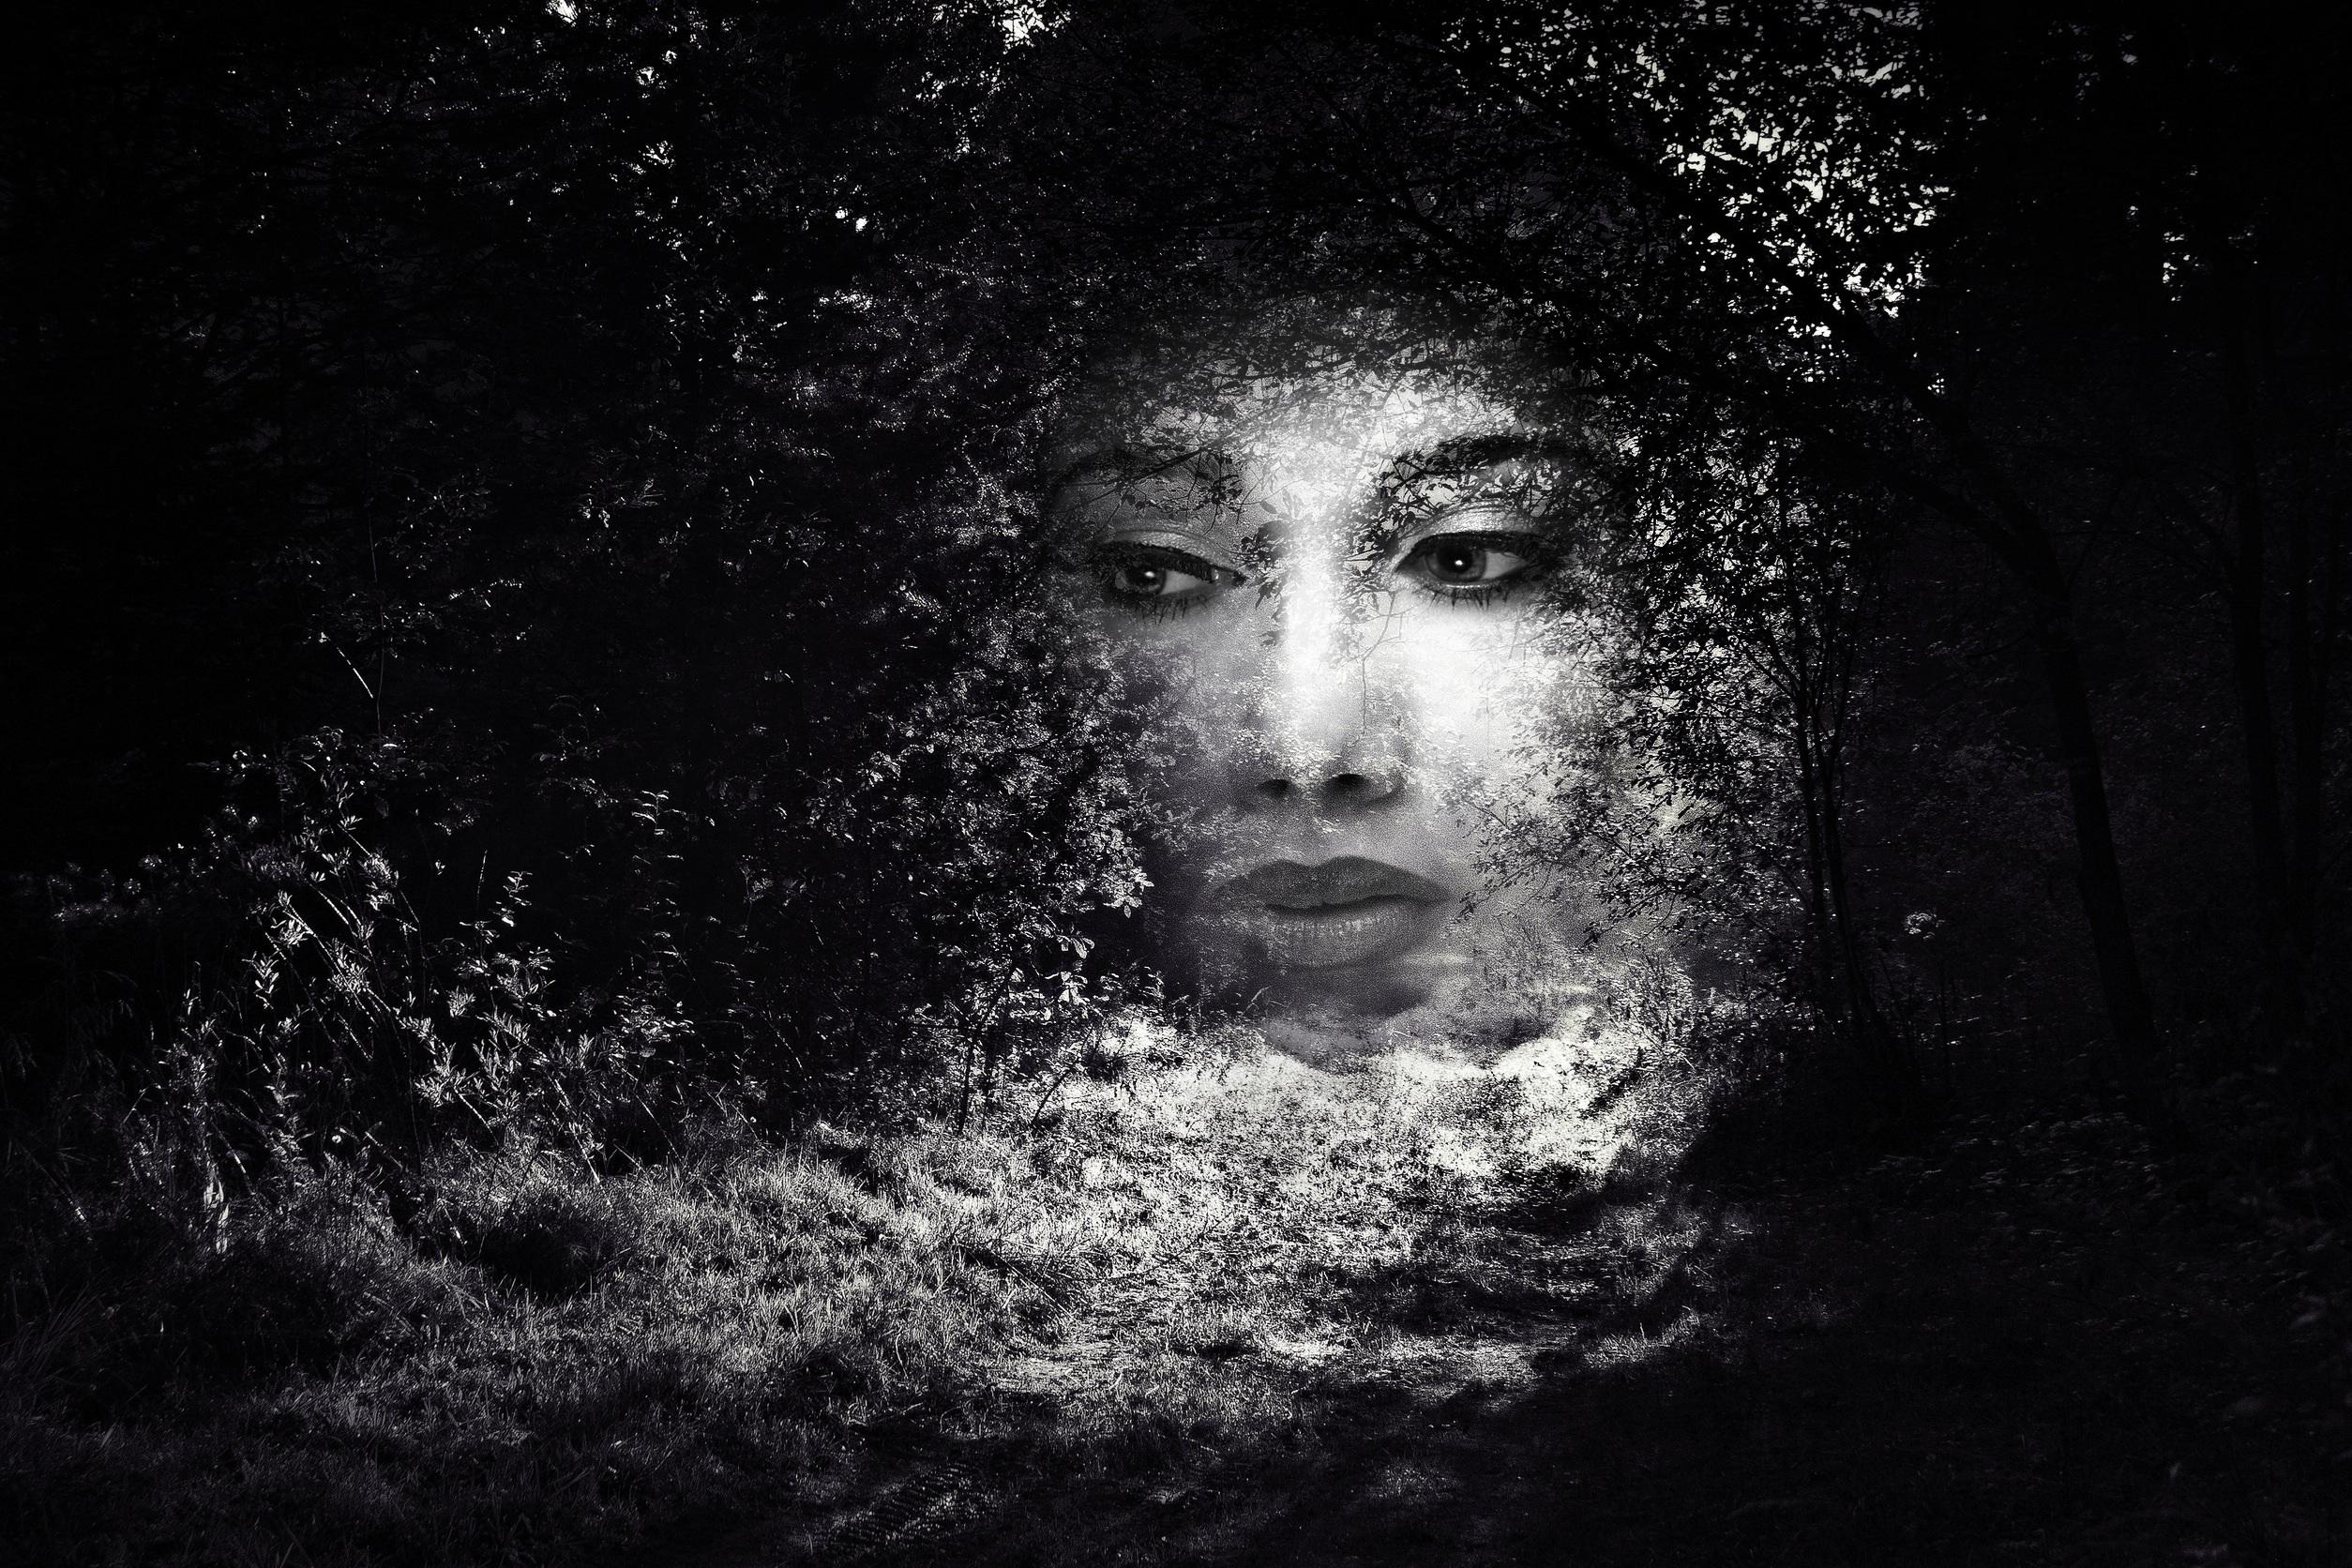 Light black and white photography photo darkness black monochrome manipulation image editing monochrome photography album cover